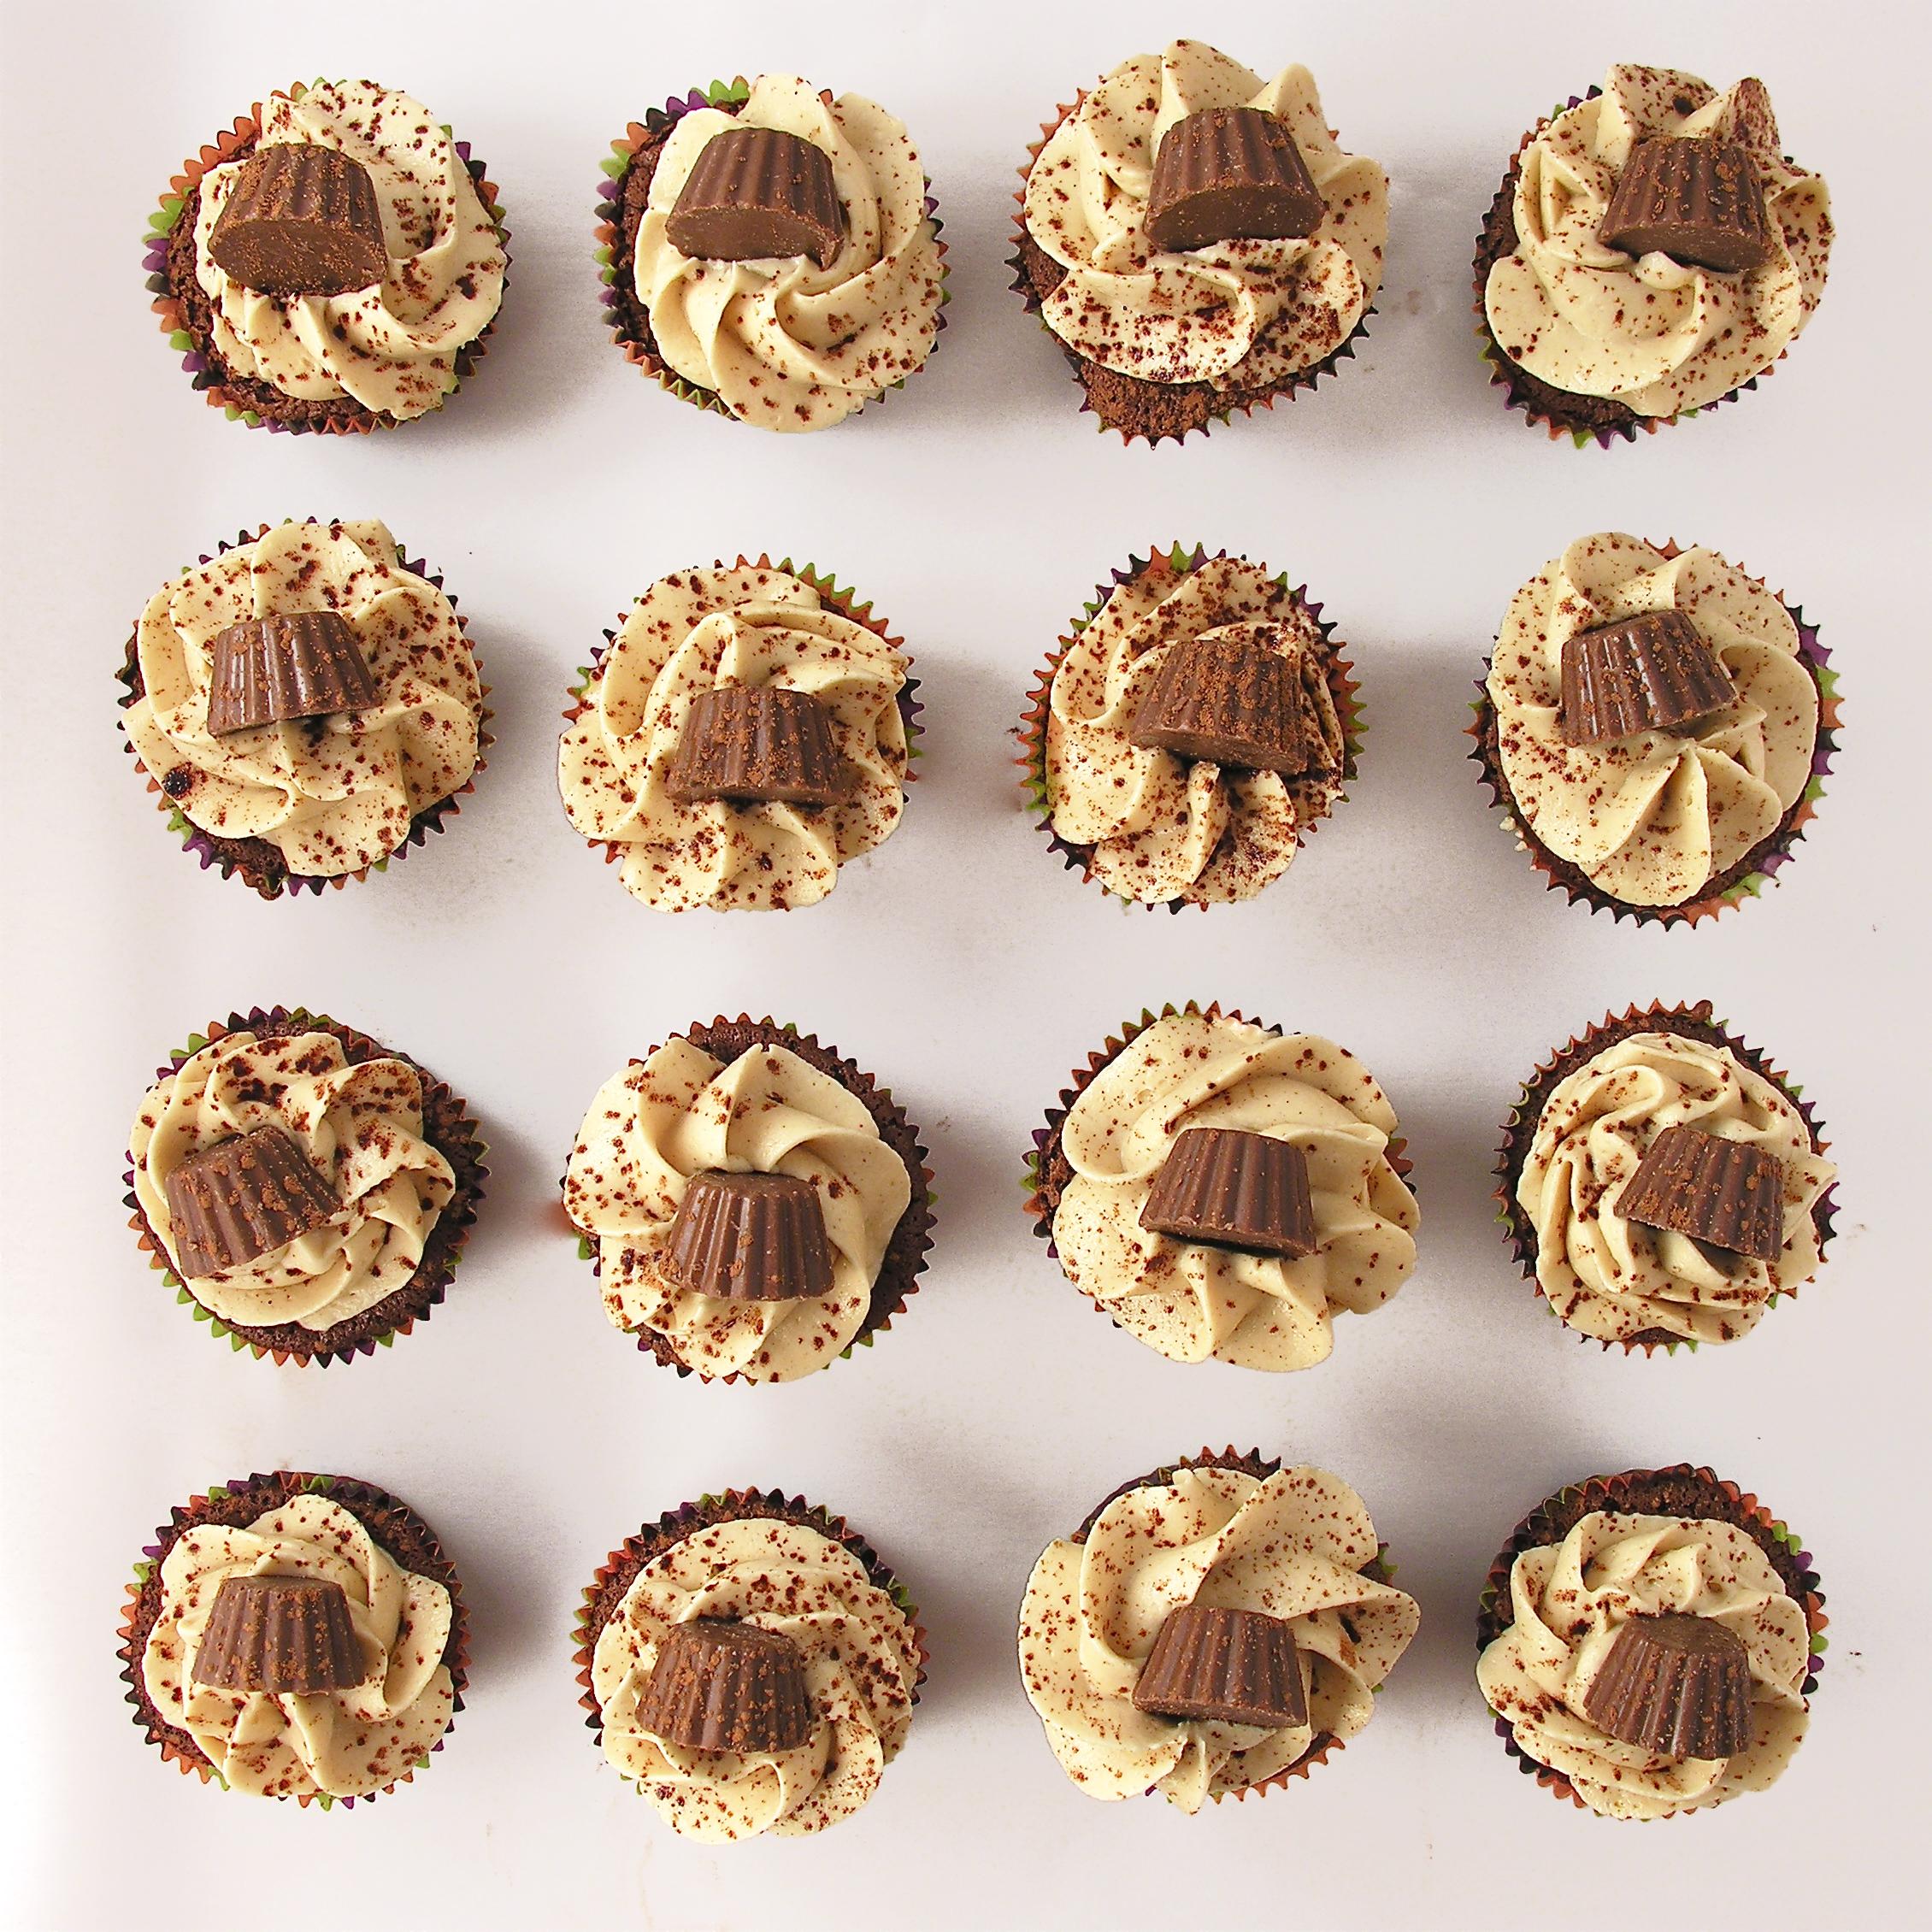 peanut butter fudge cupcakes